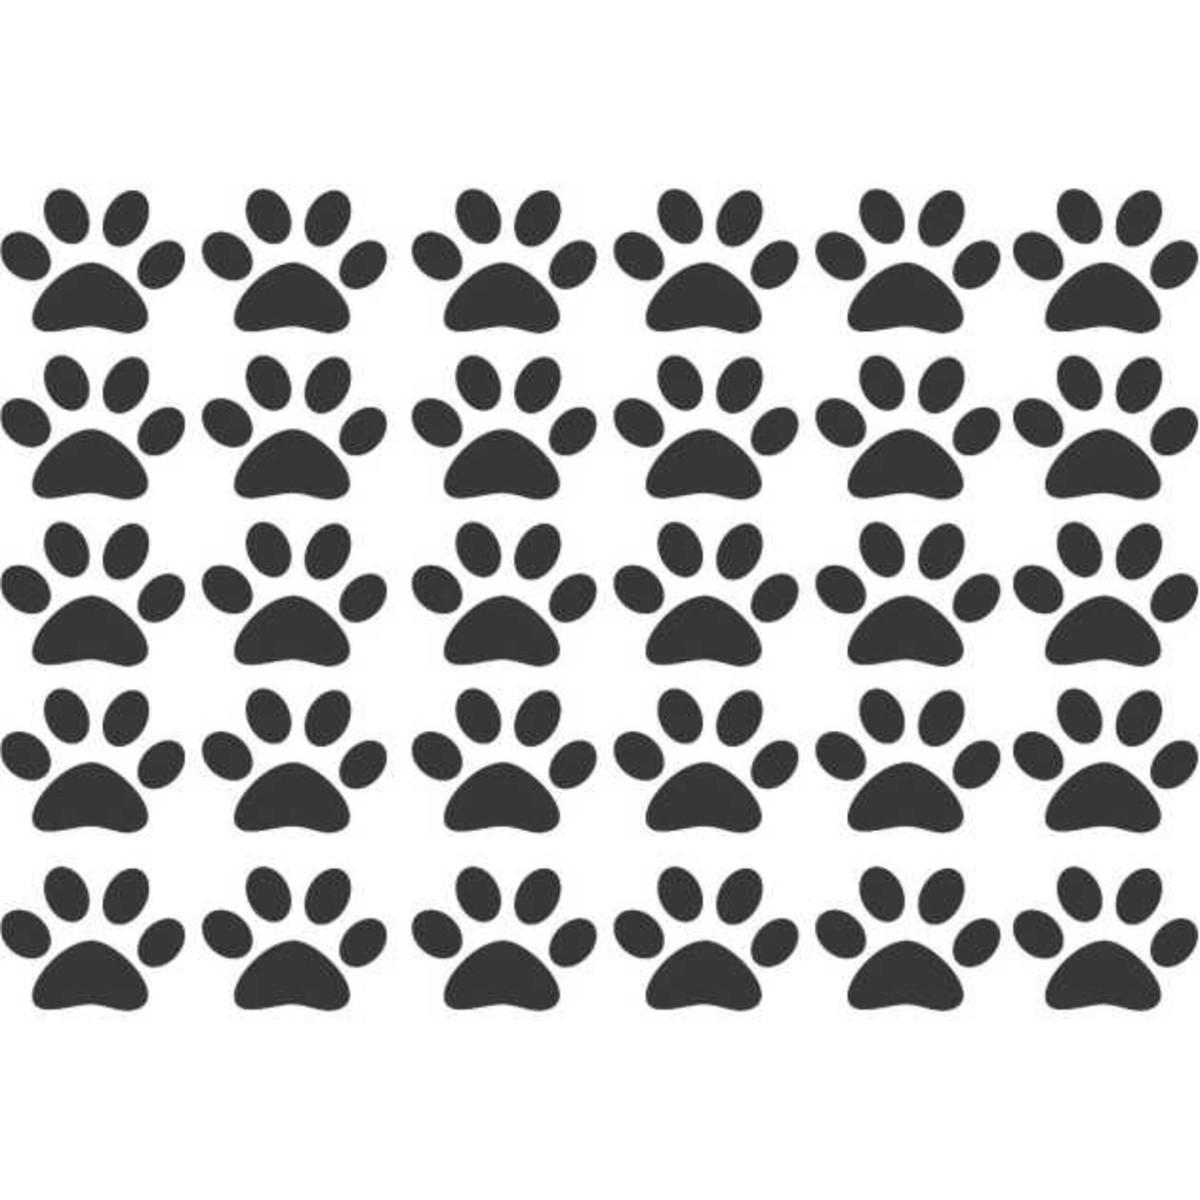 d89f18a48012c Adesivo Patas Patinha Cachorro Dog Pet Queen Indústria De Adesivos Elo7